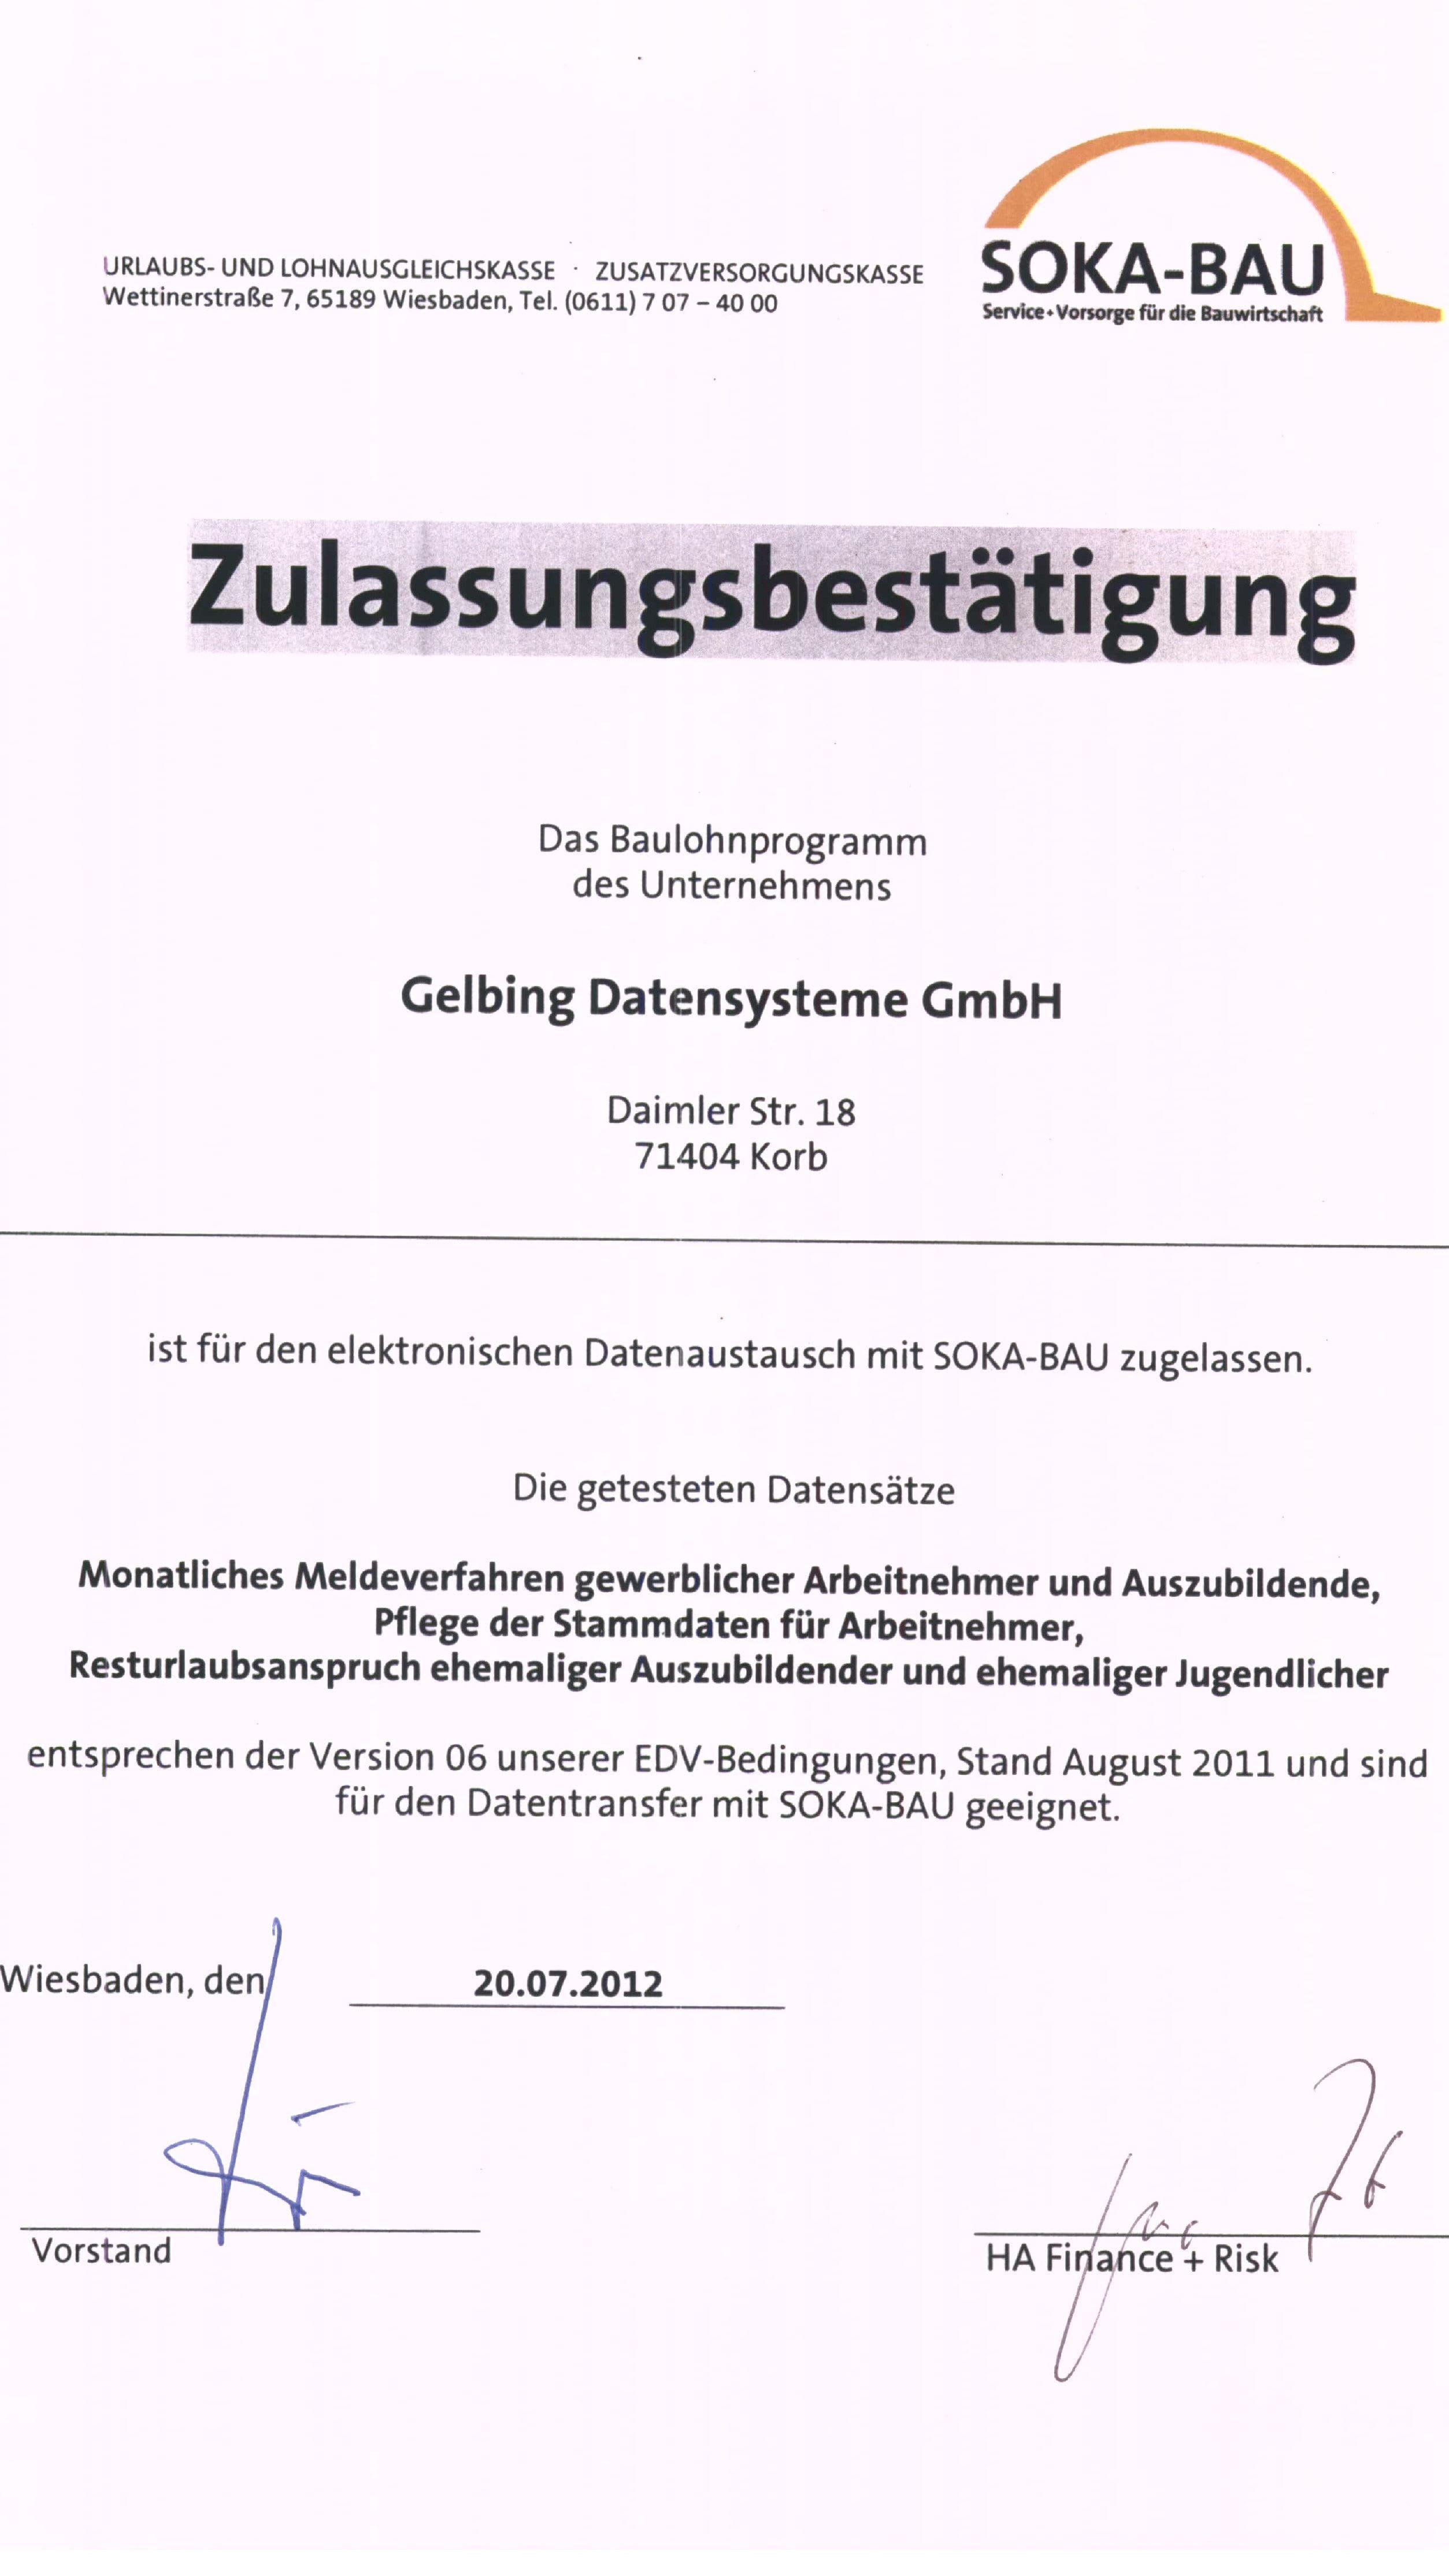 Soka-Bau Zulassung Gelbing